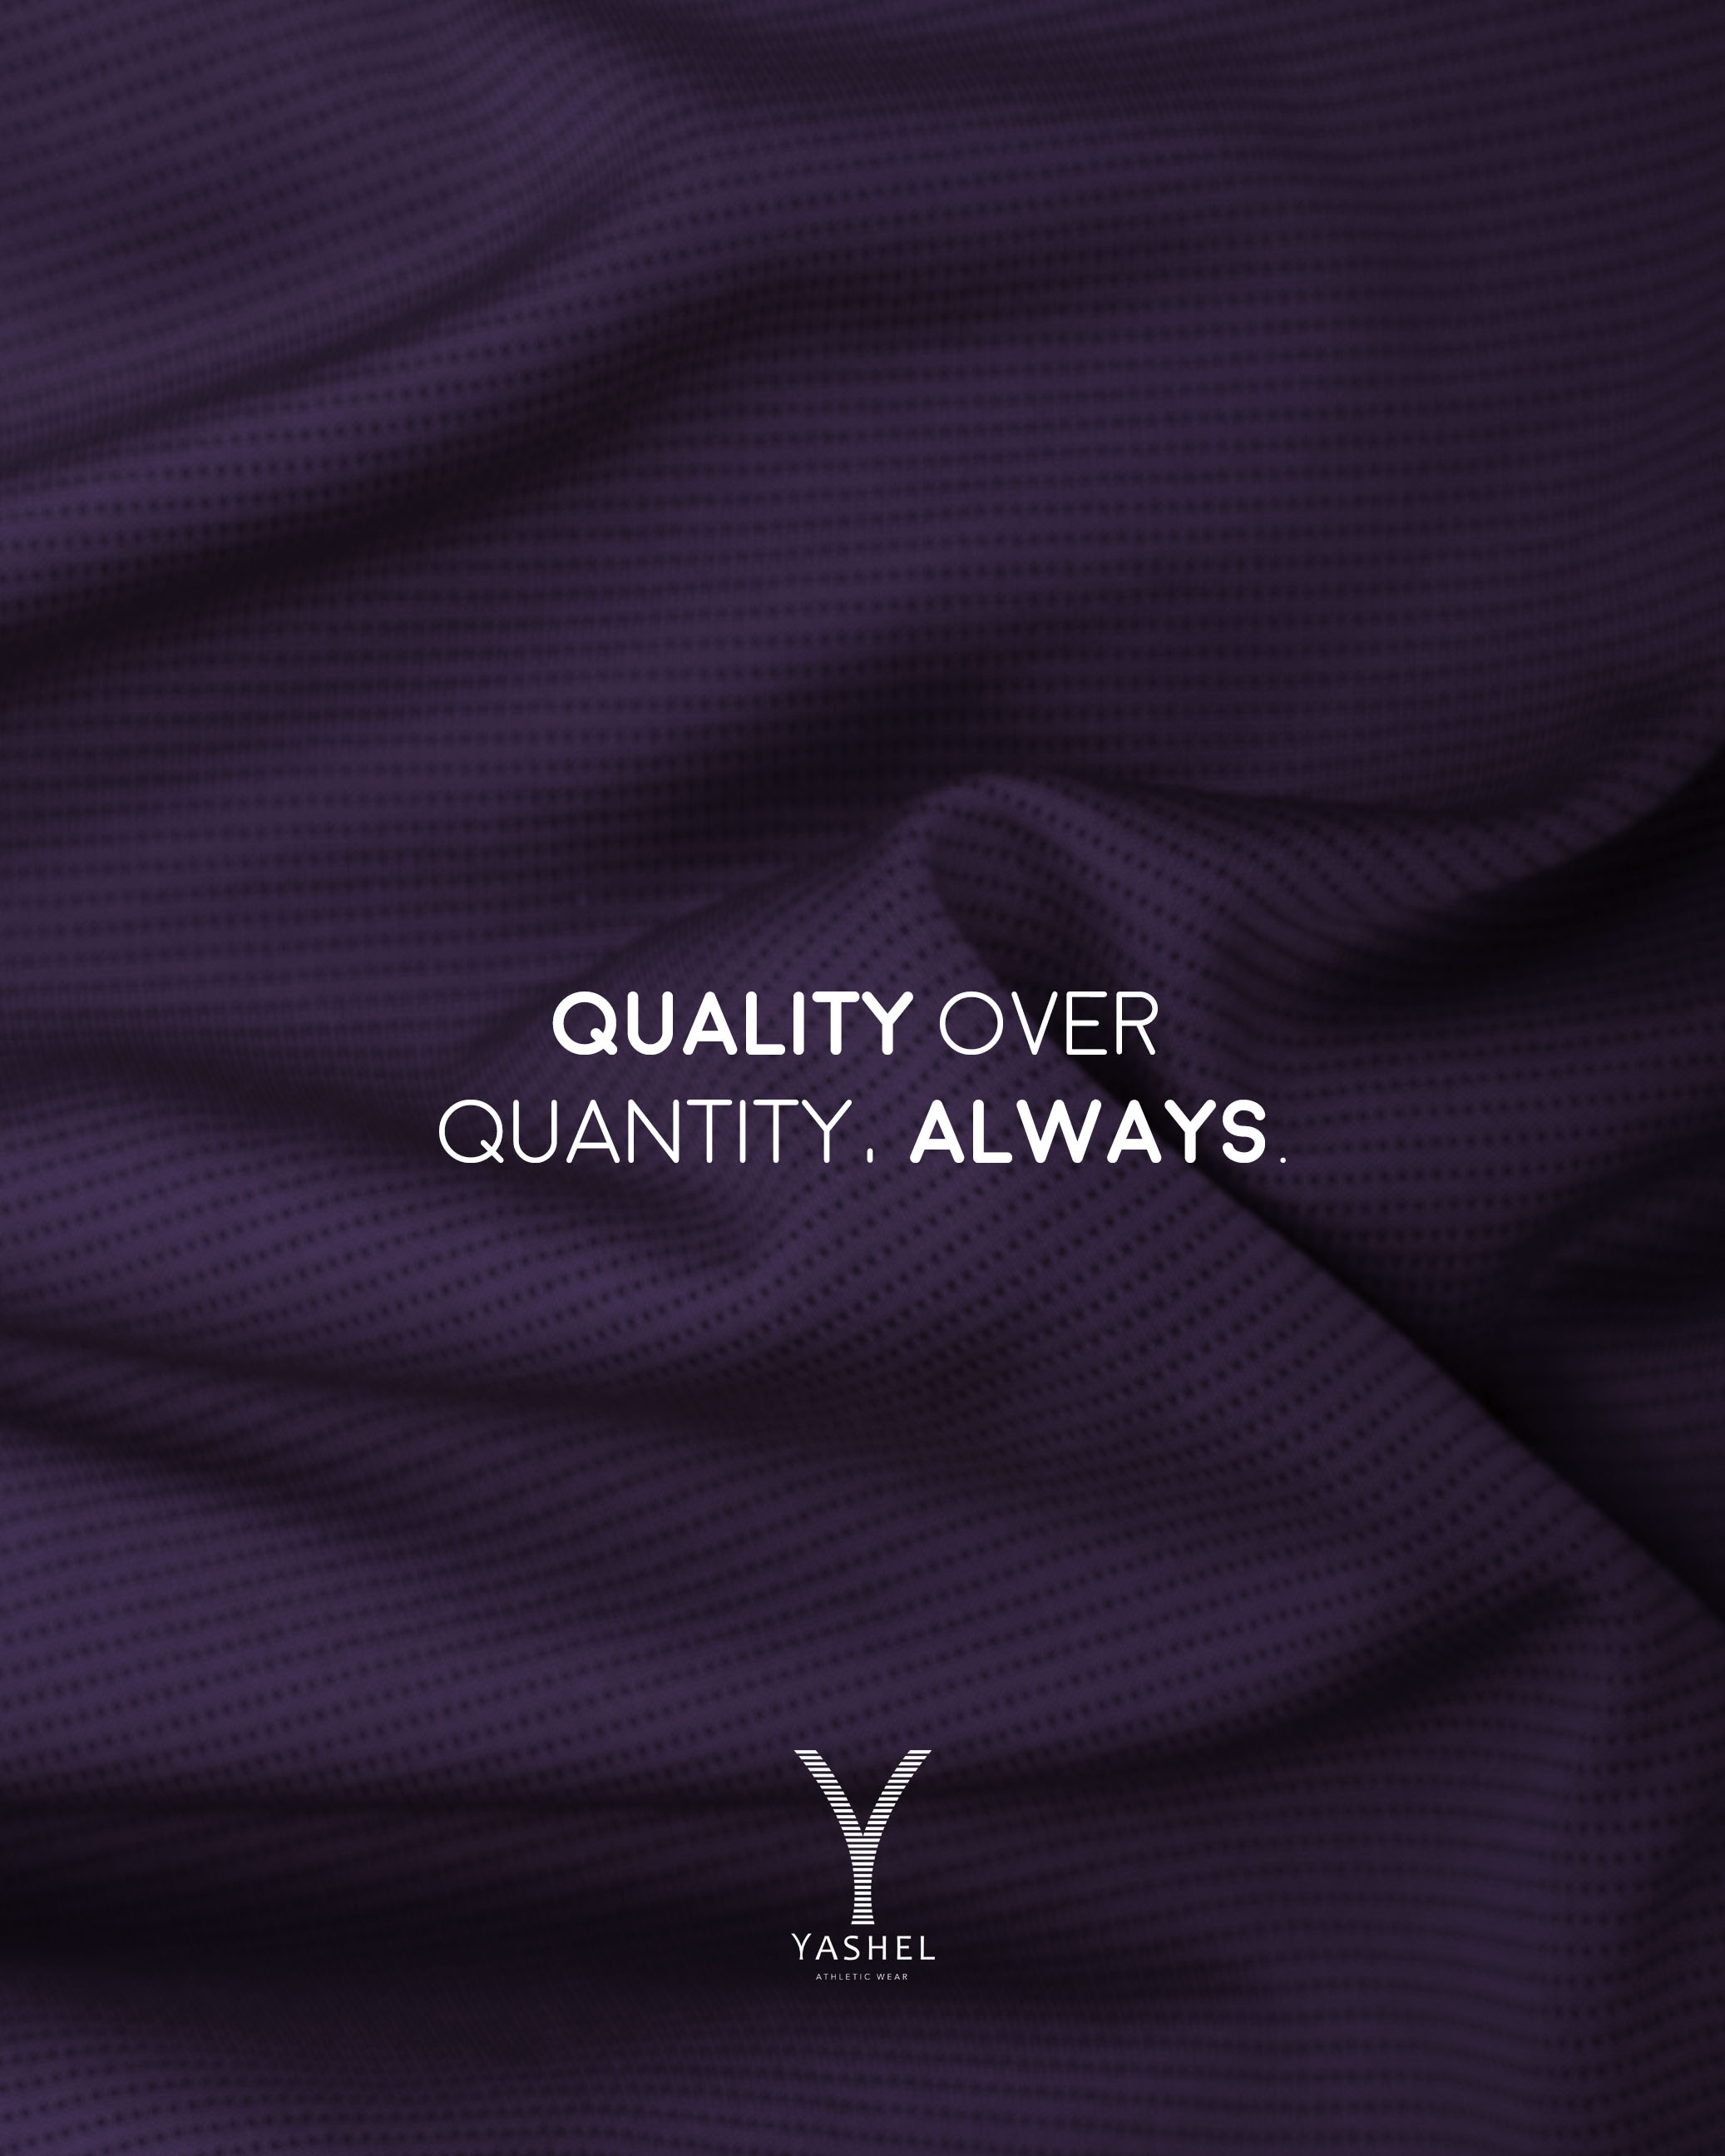 Yashel Quality over Quantity.jpg